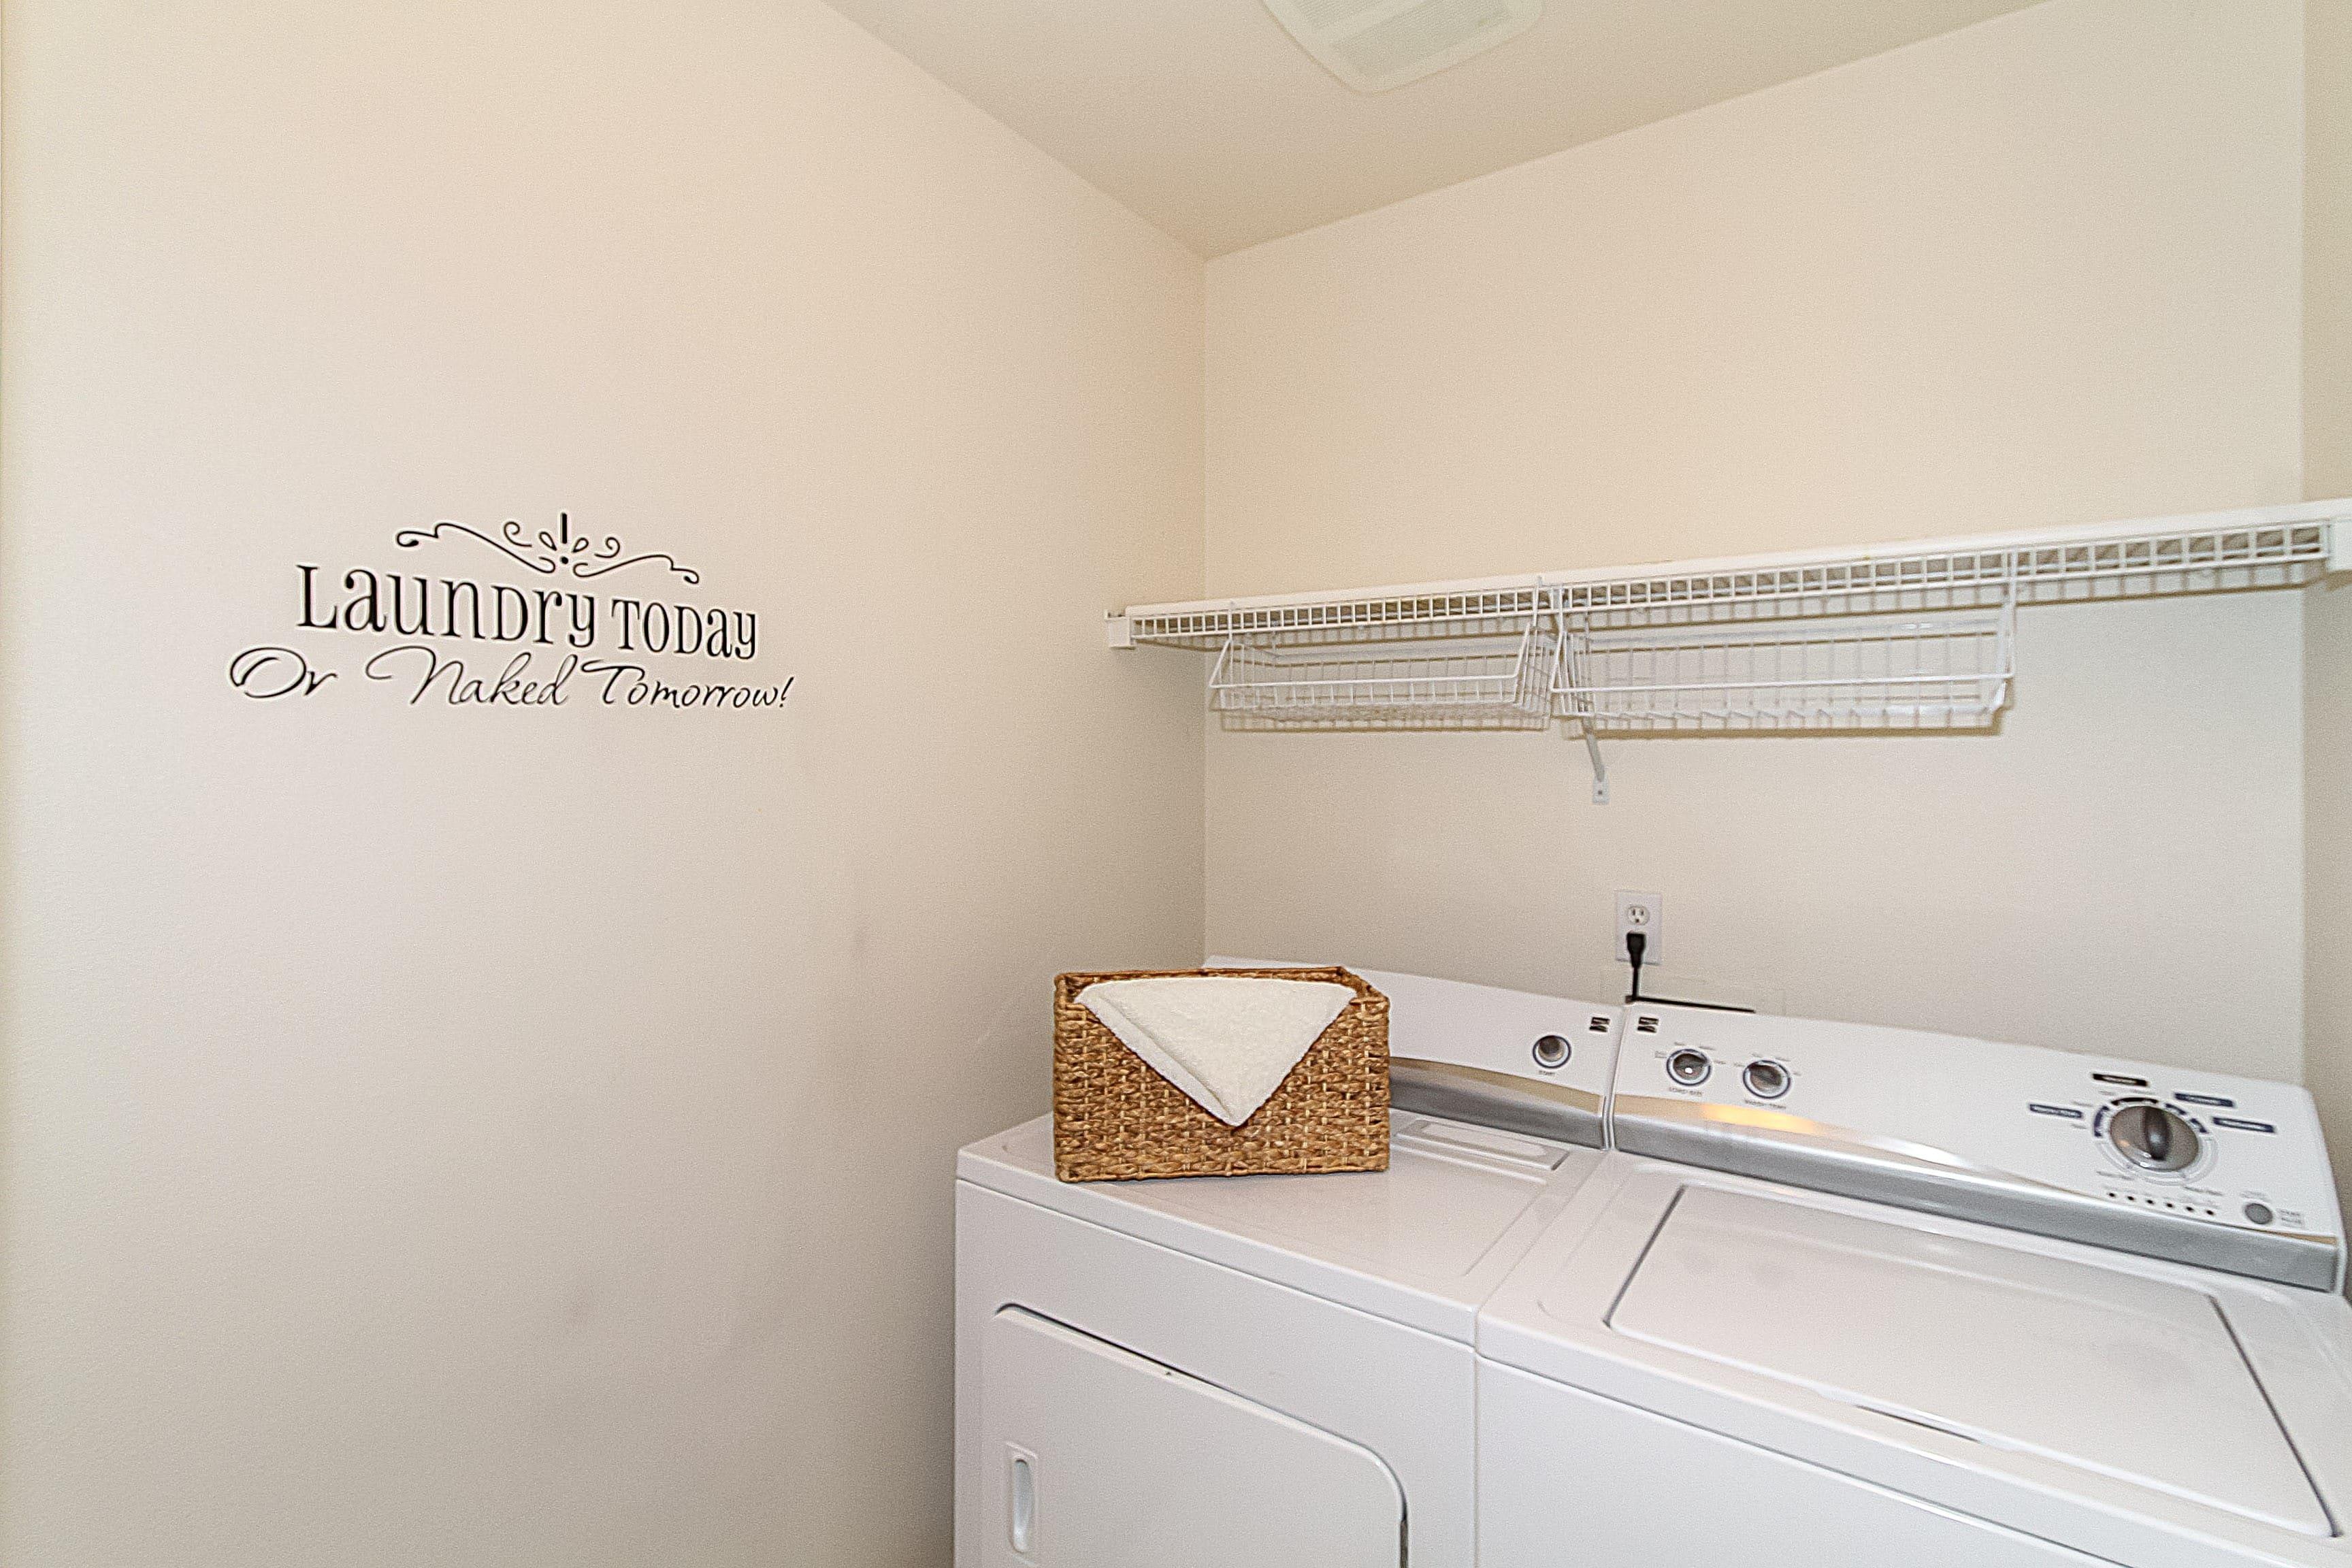 021_Laundry Room